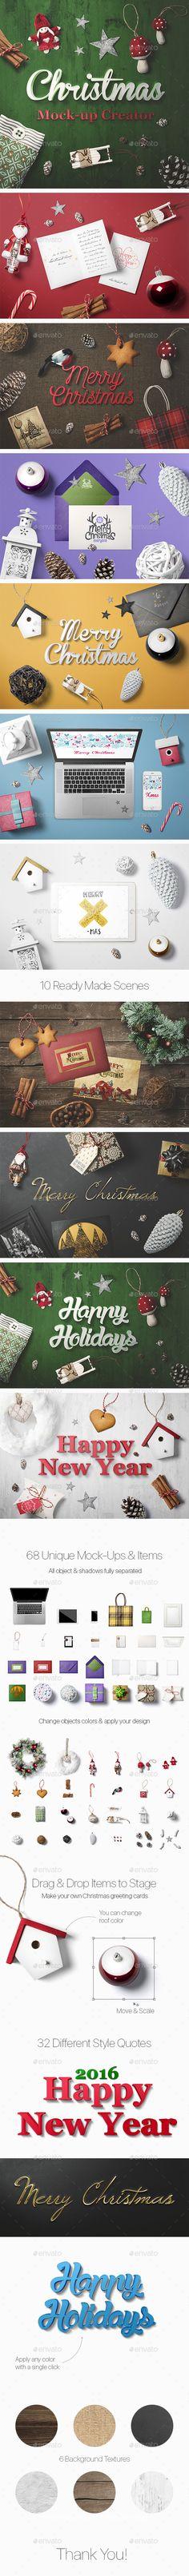 Christmas Mock-Up Creator #design Download: http://graphicriver.net/item/christmas-mockup-creator/13664788?ref=ksioks